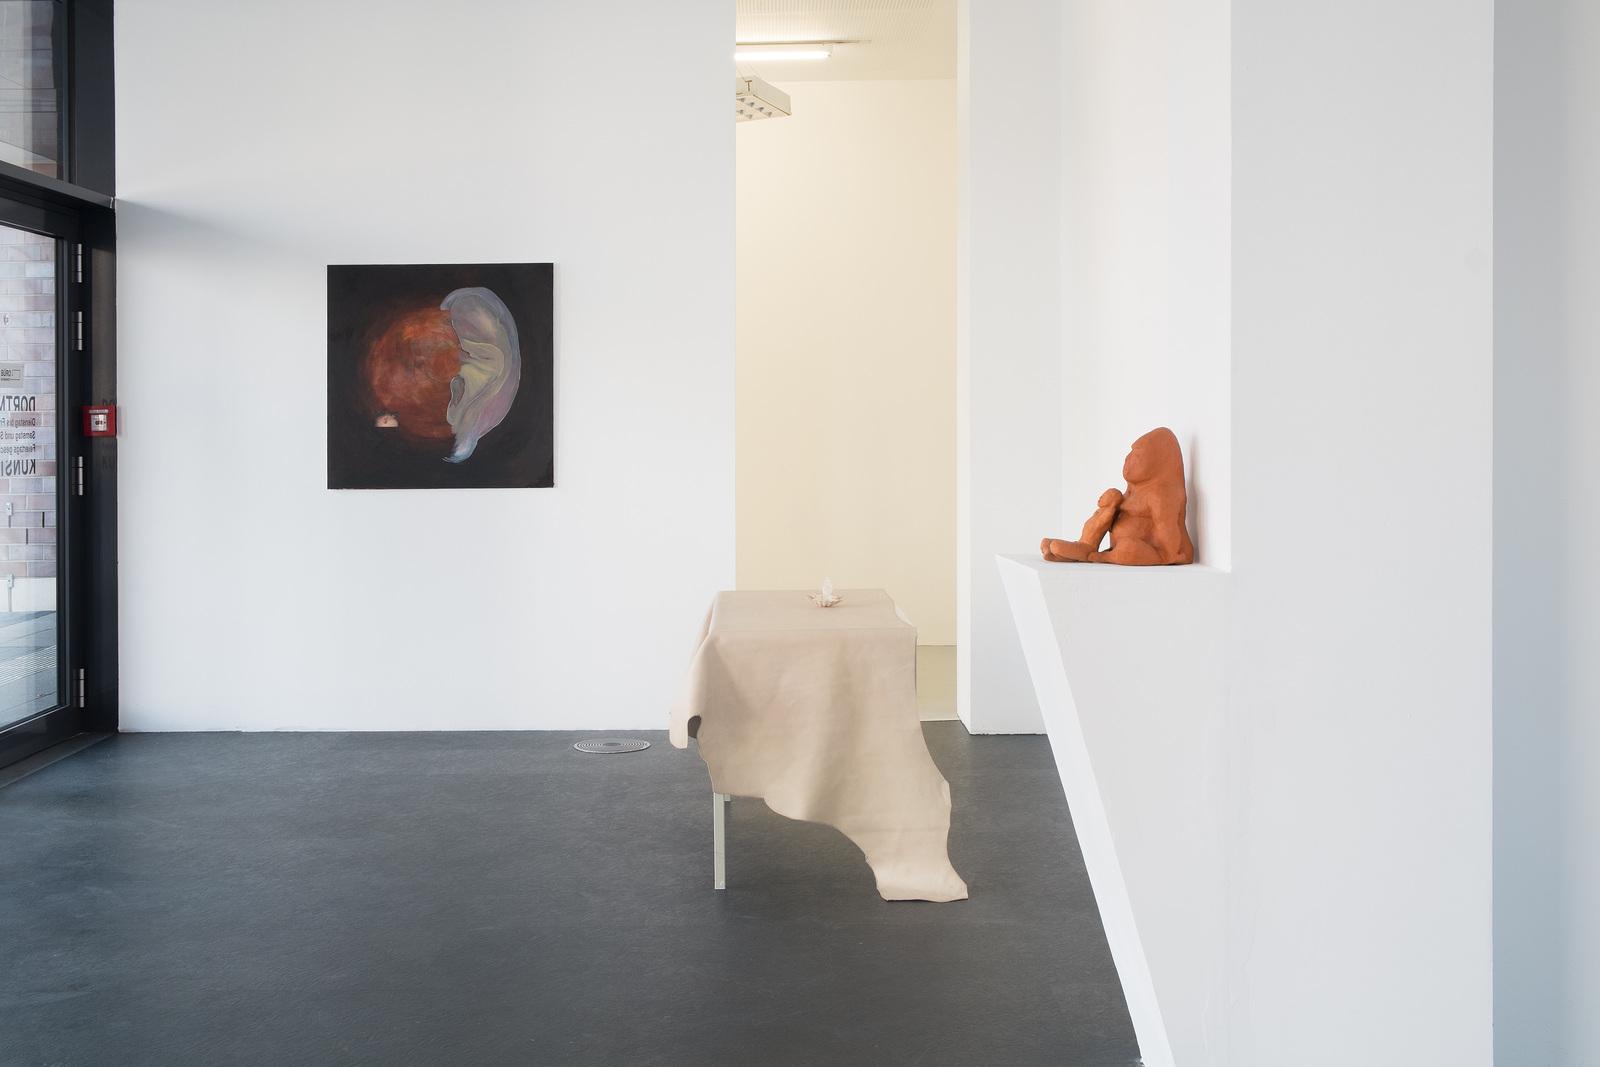 1_Installation view_ICHTS_2016_Dortmunder Kunstverein_Foto Niklas Taleb